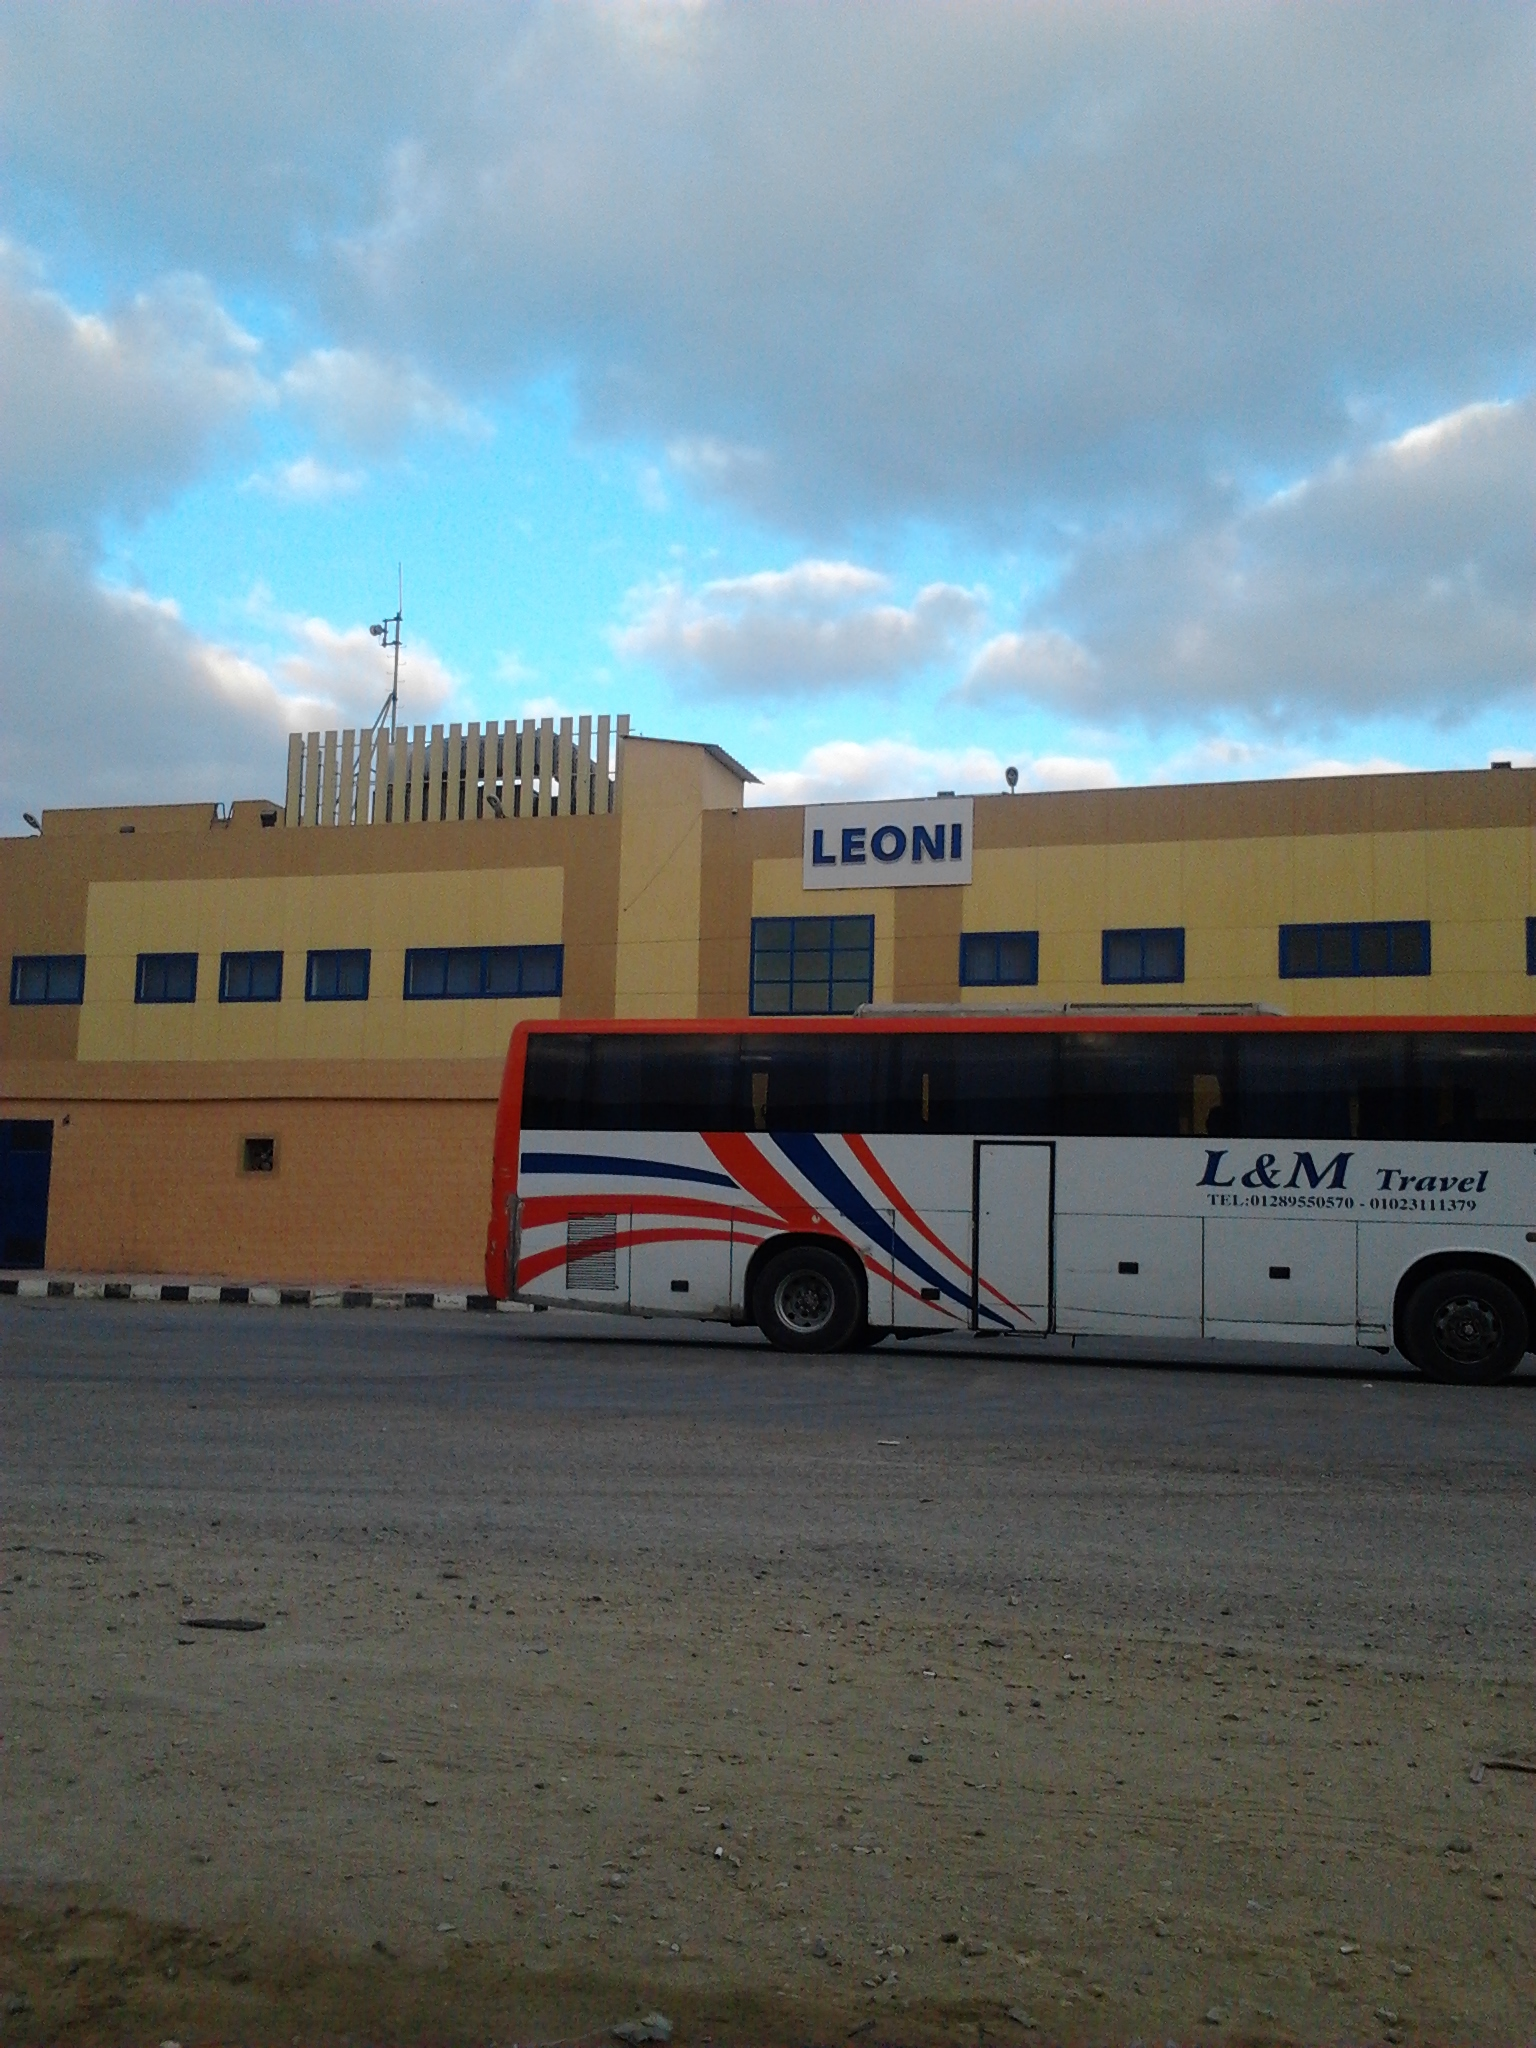 Enjoyable Leoni Wiring Systems Egypt Badr Plant 2 Bmw Bu Badr City Wiring 101 Vieworaxxcnl